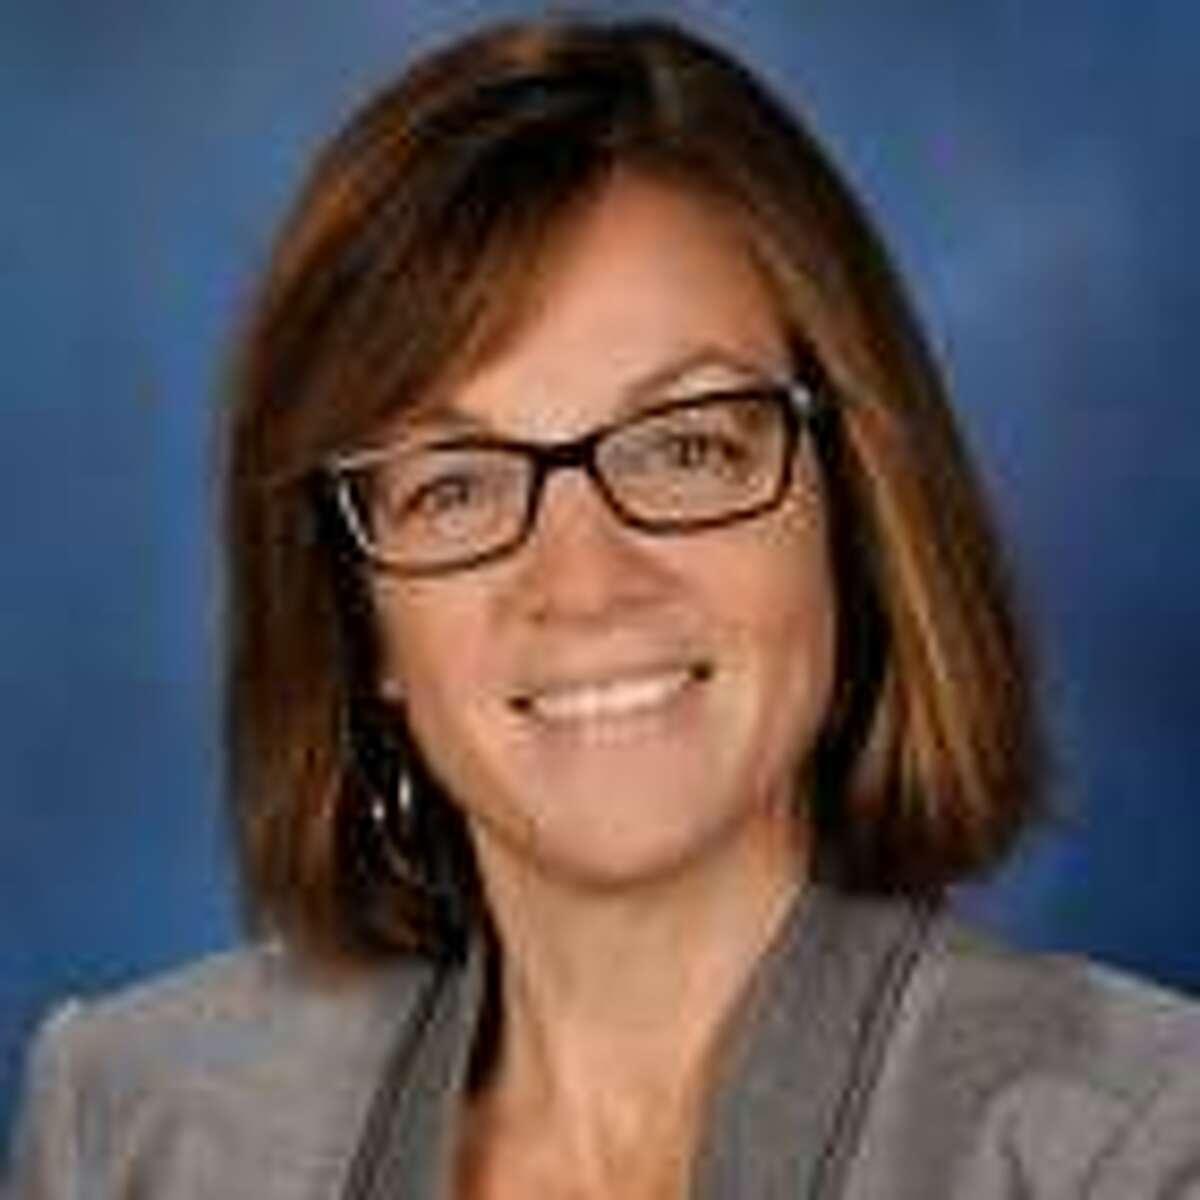 State Rep. Katie Stuart, D-Edwardsville